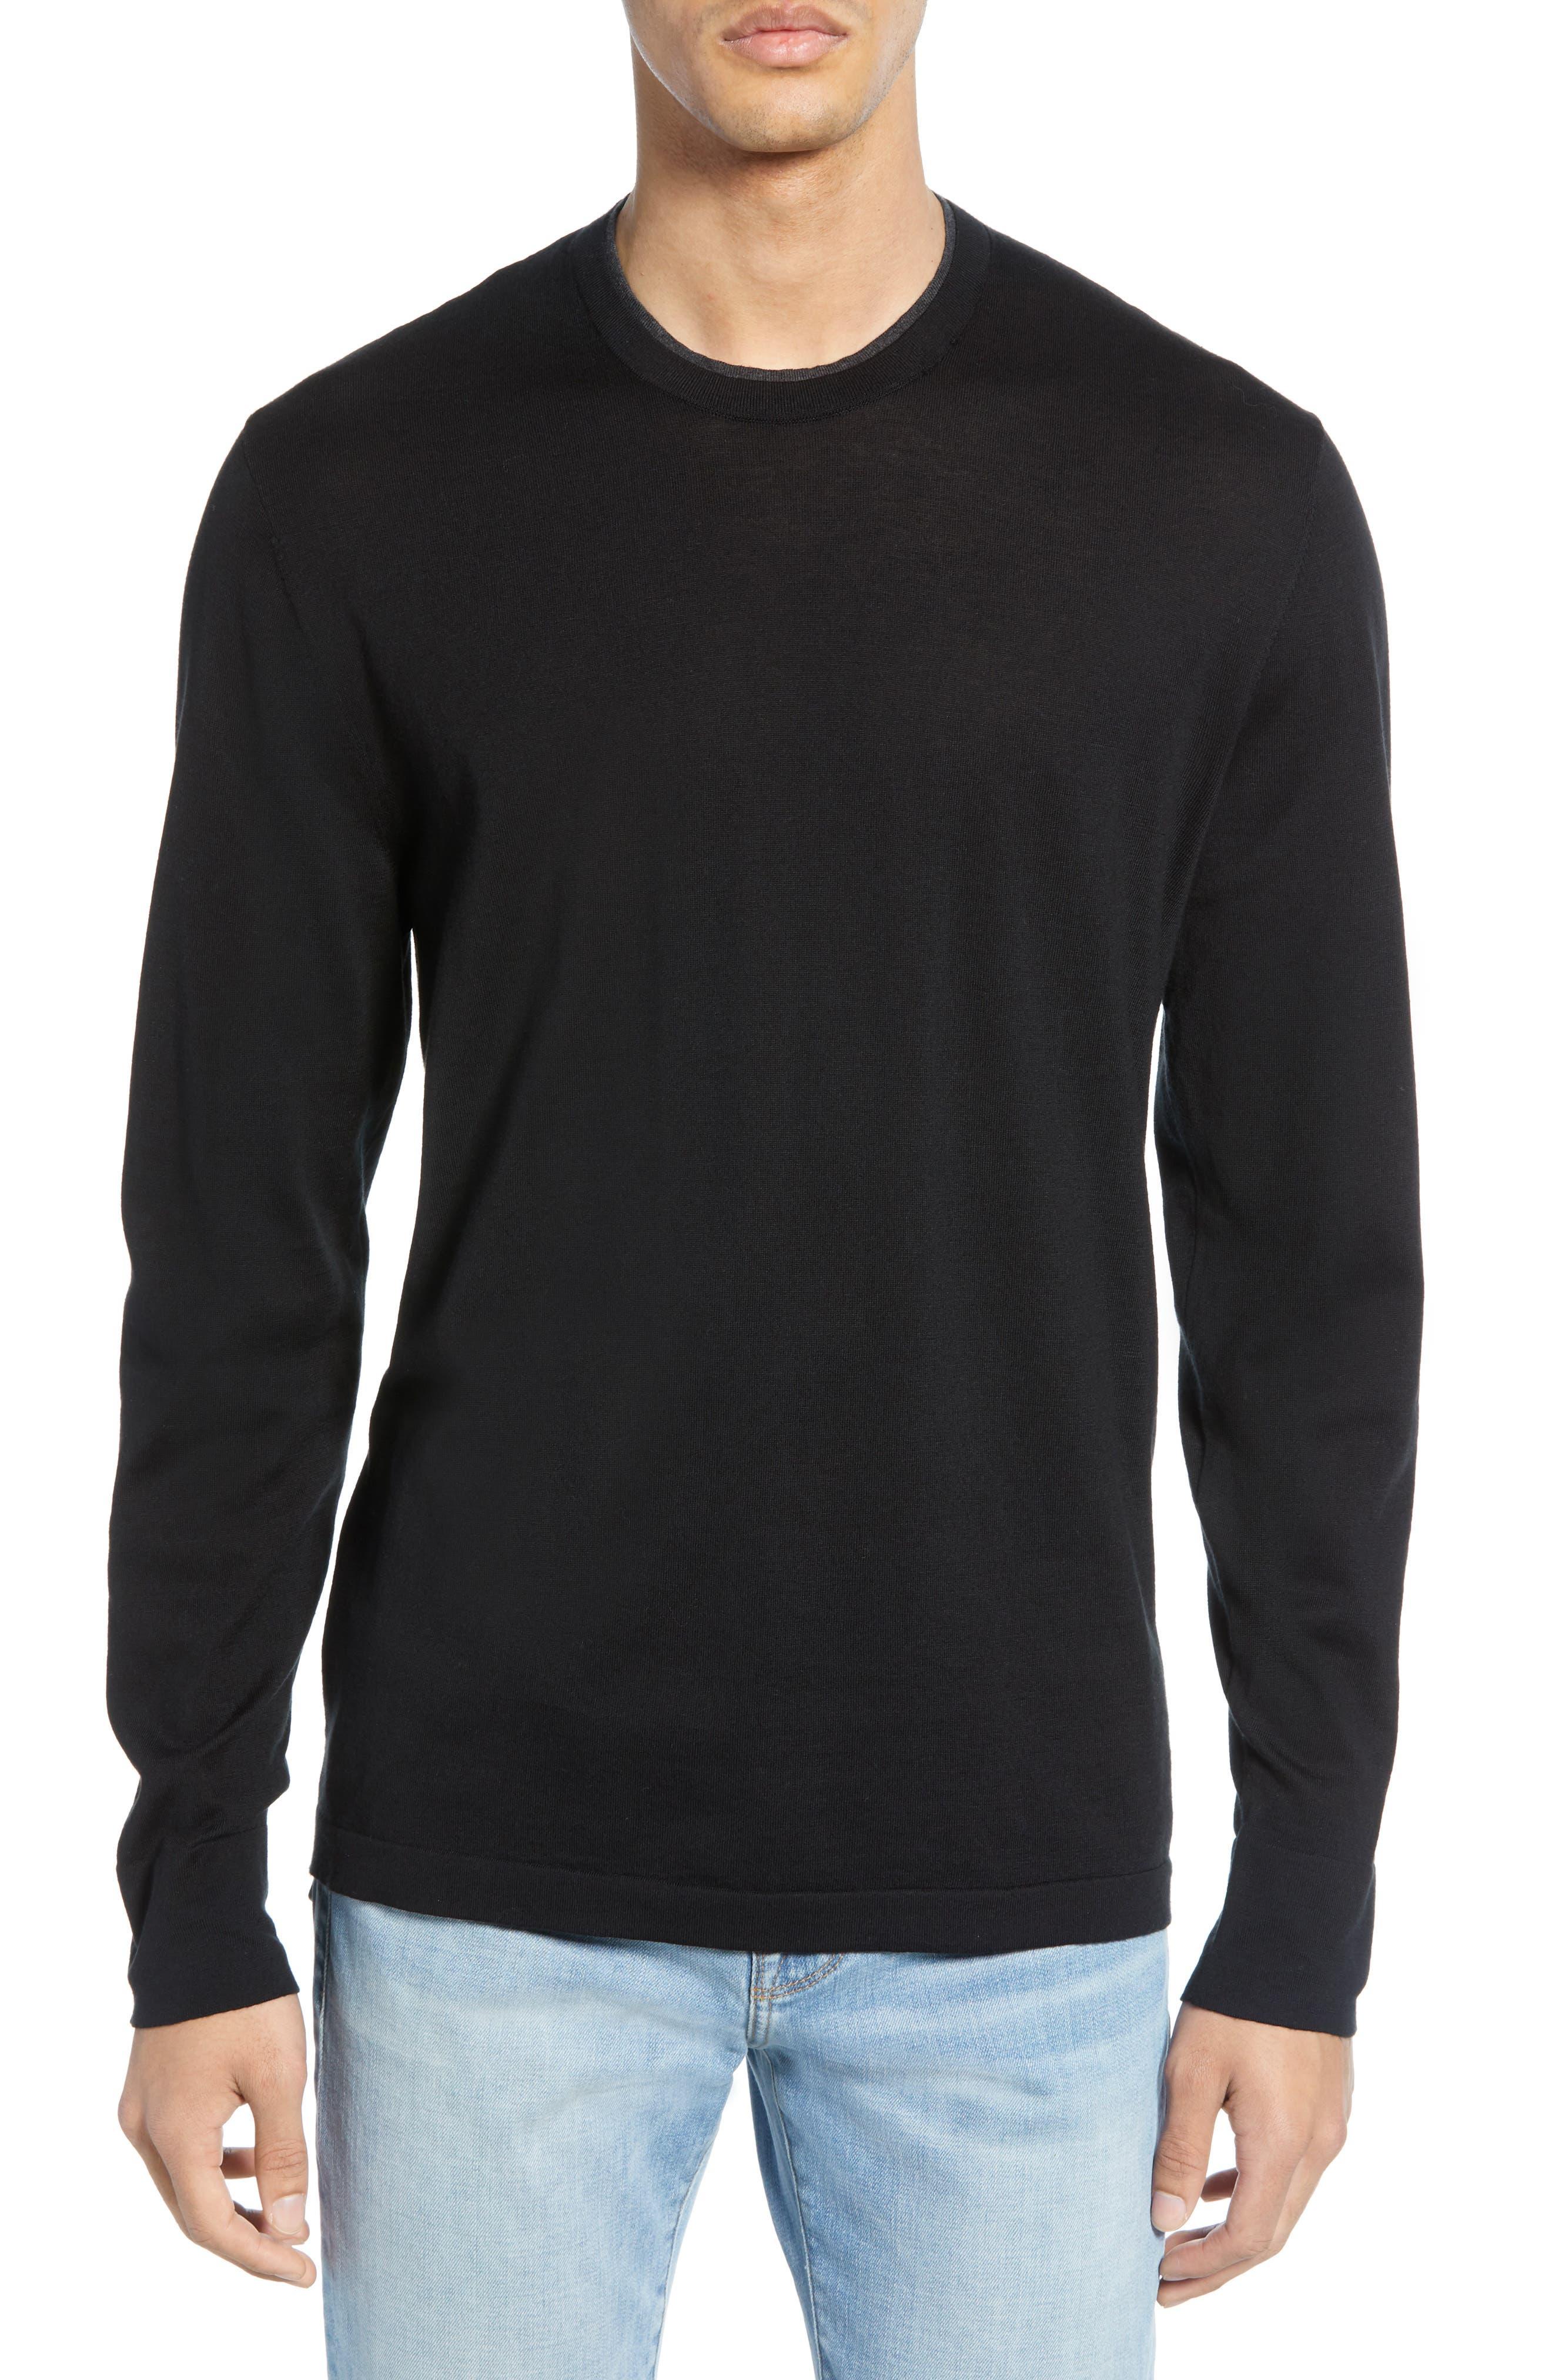 James Perse Slim Fit Cotton Crewneck Sweater, Black